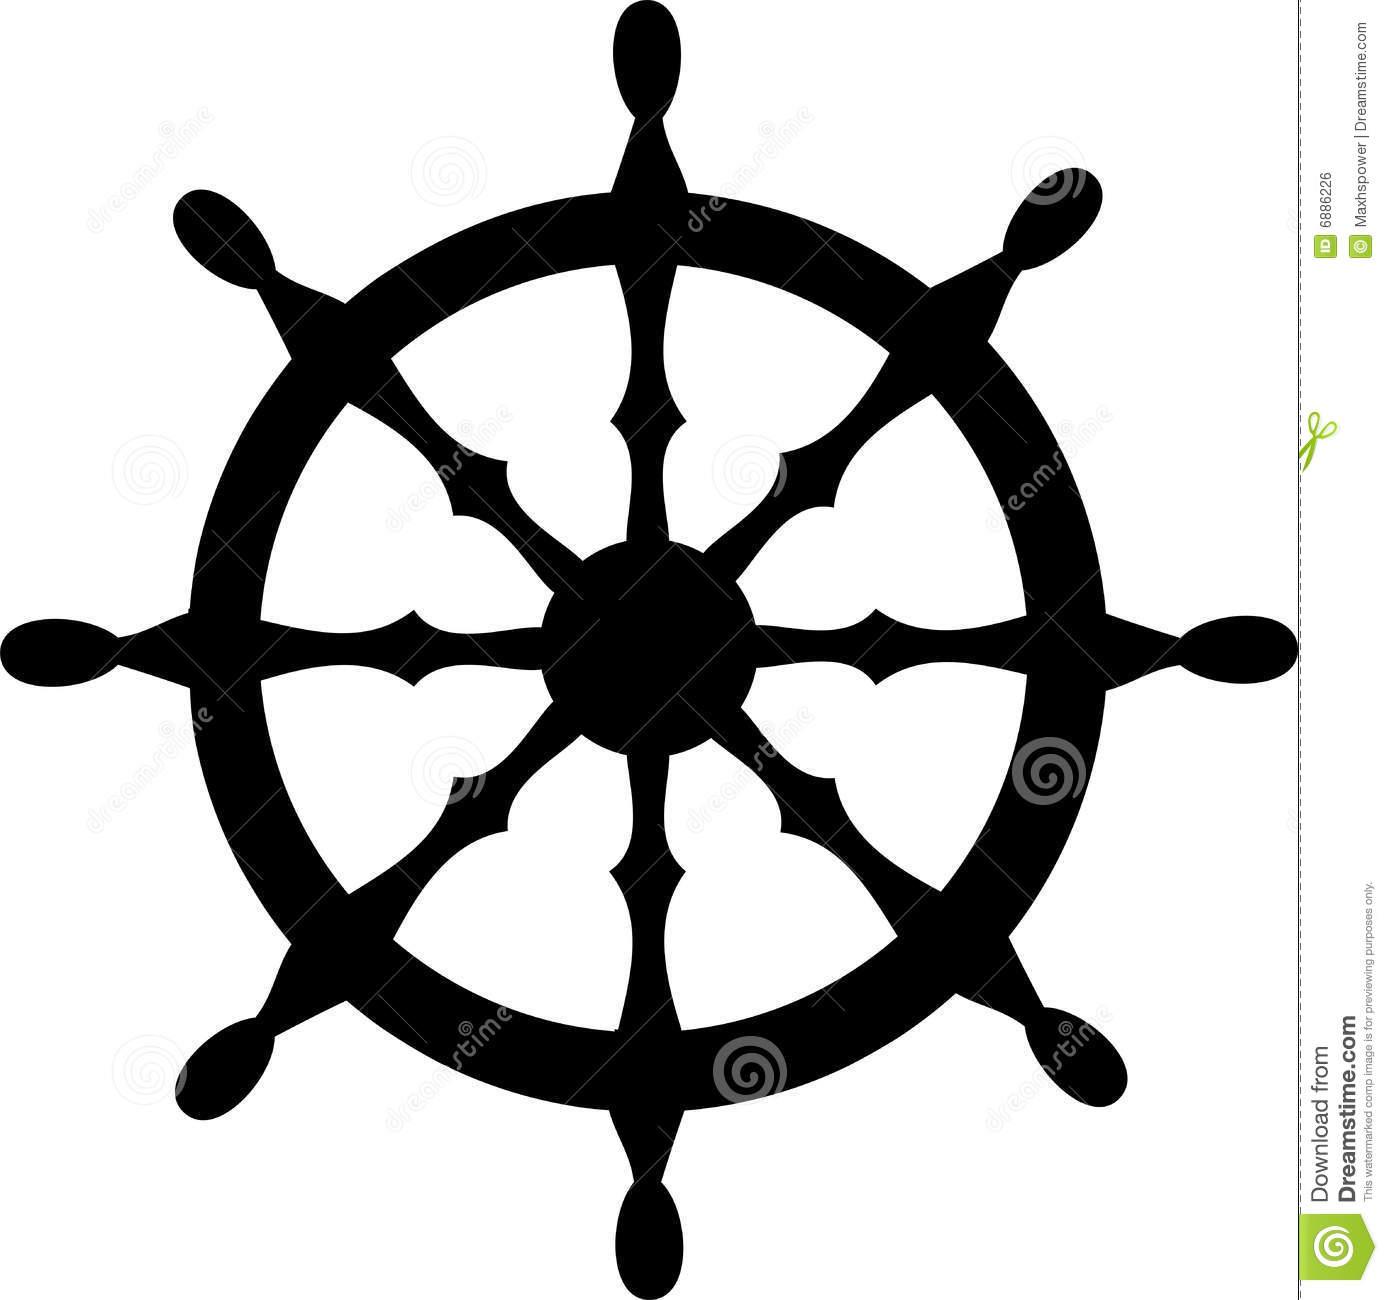 1388x1300 Ship Clipart Ship Steering Wheel